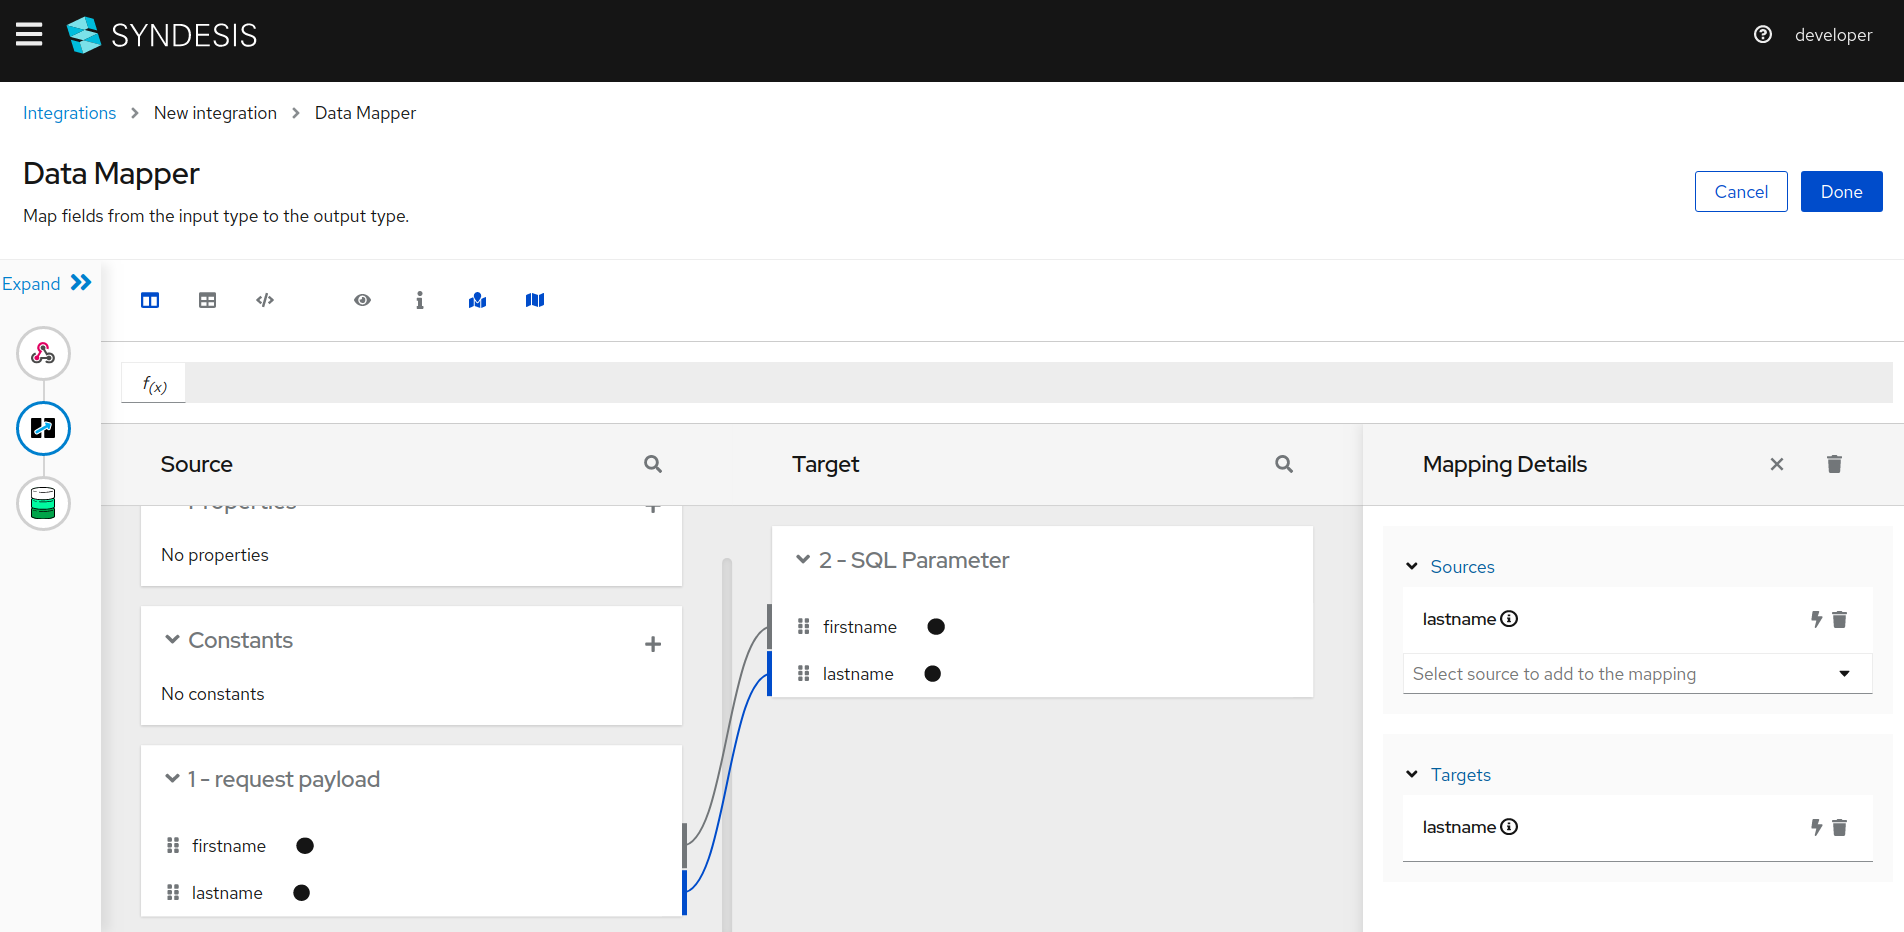 Data Mapper page